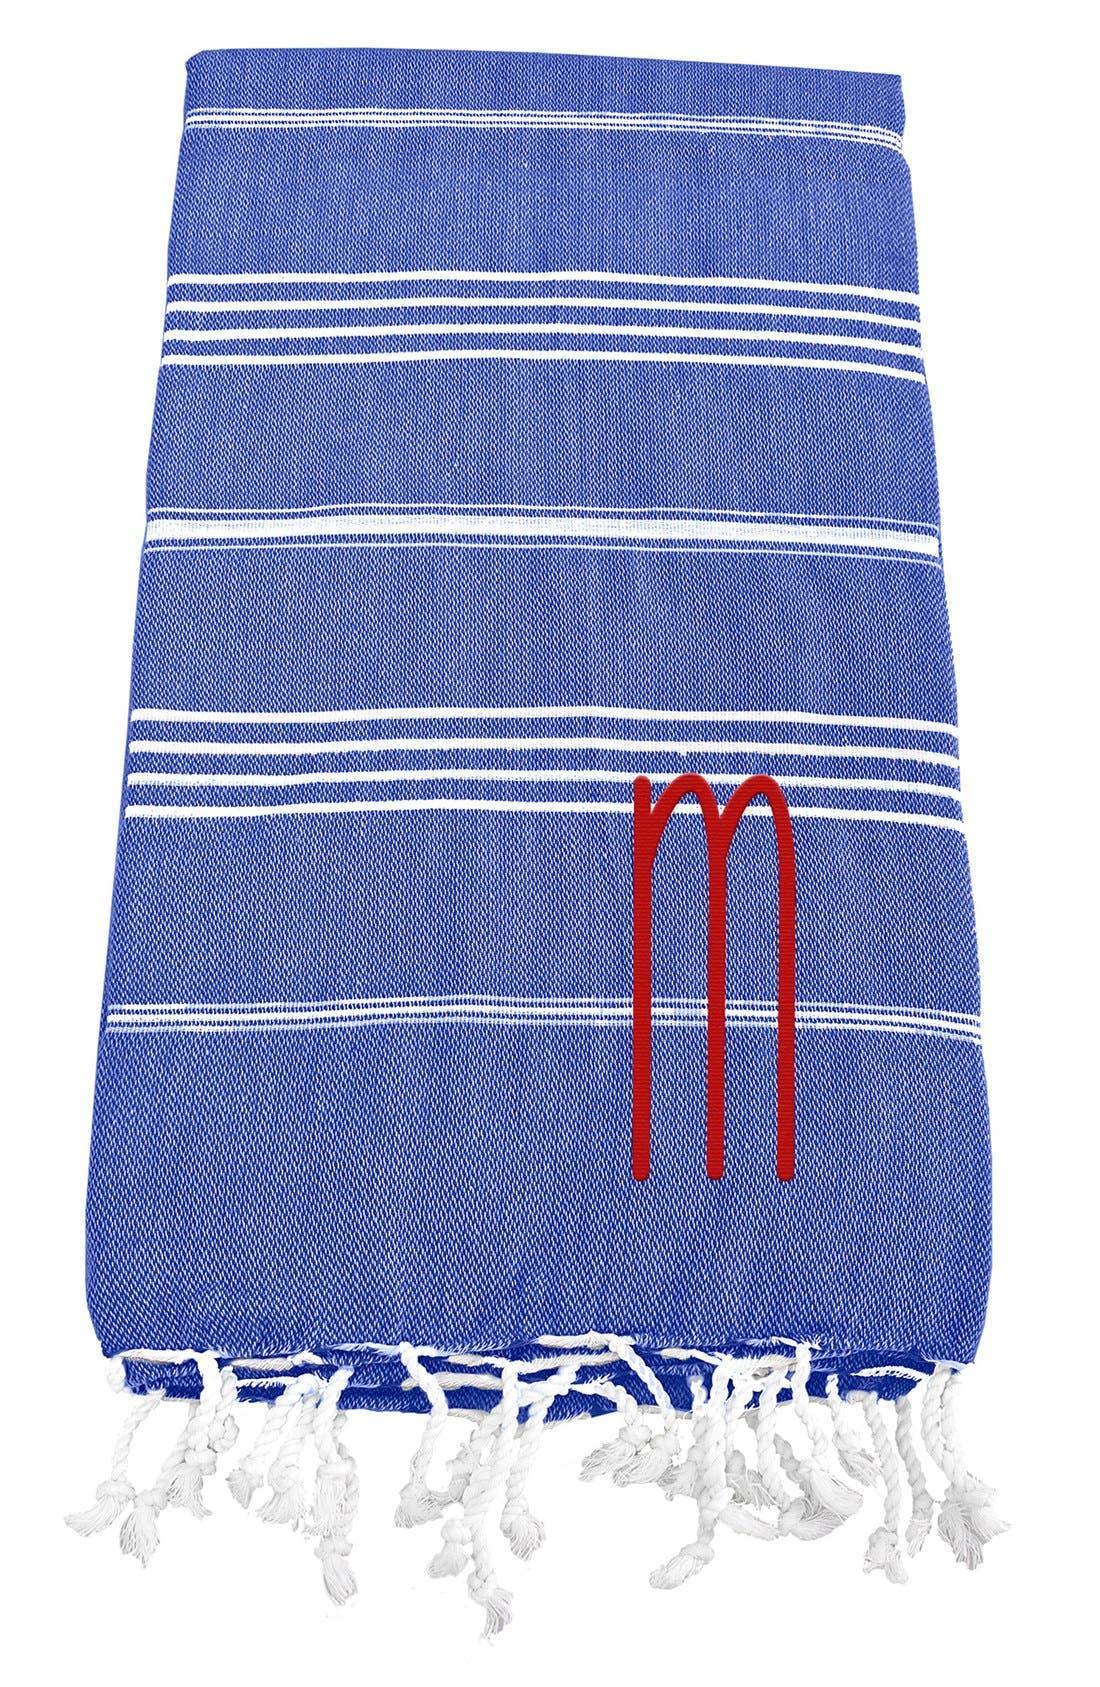 Monogram Turkish Cotton Towel,                             Main thumbnail 69, color,